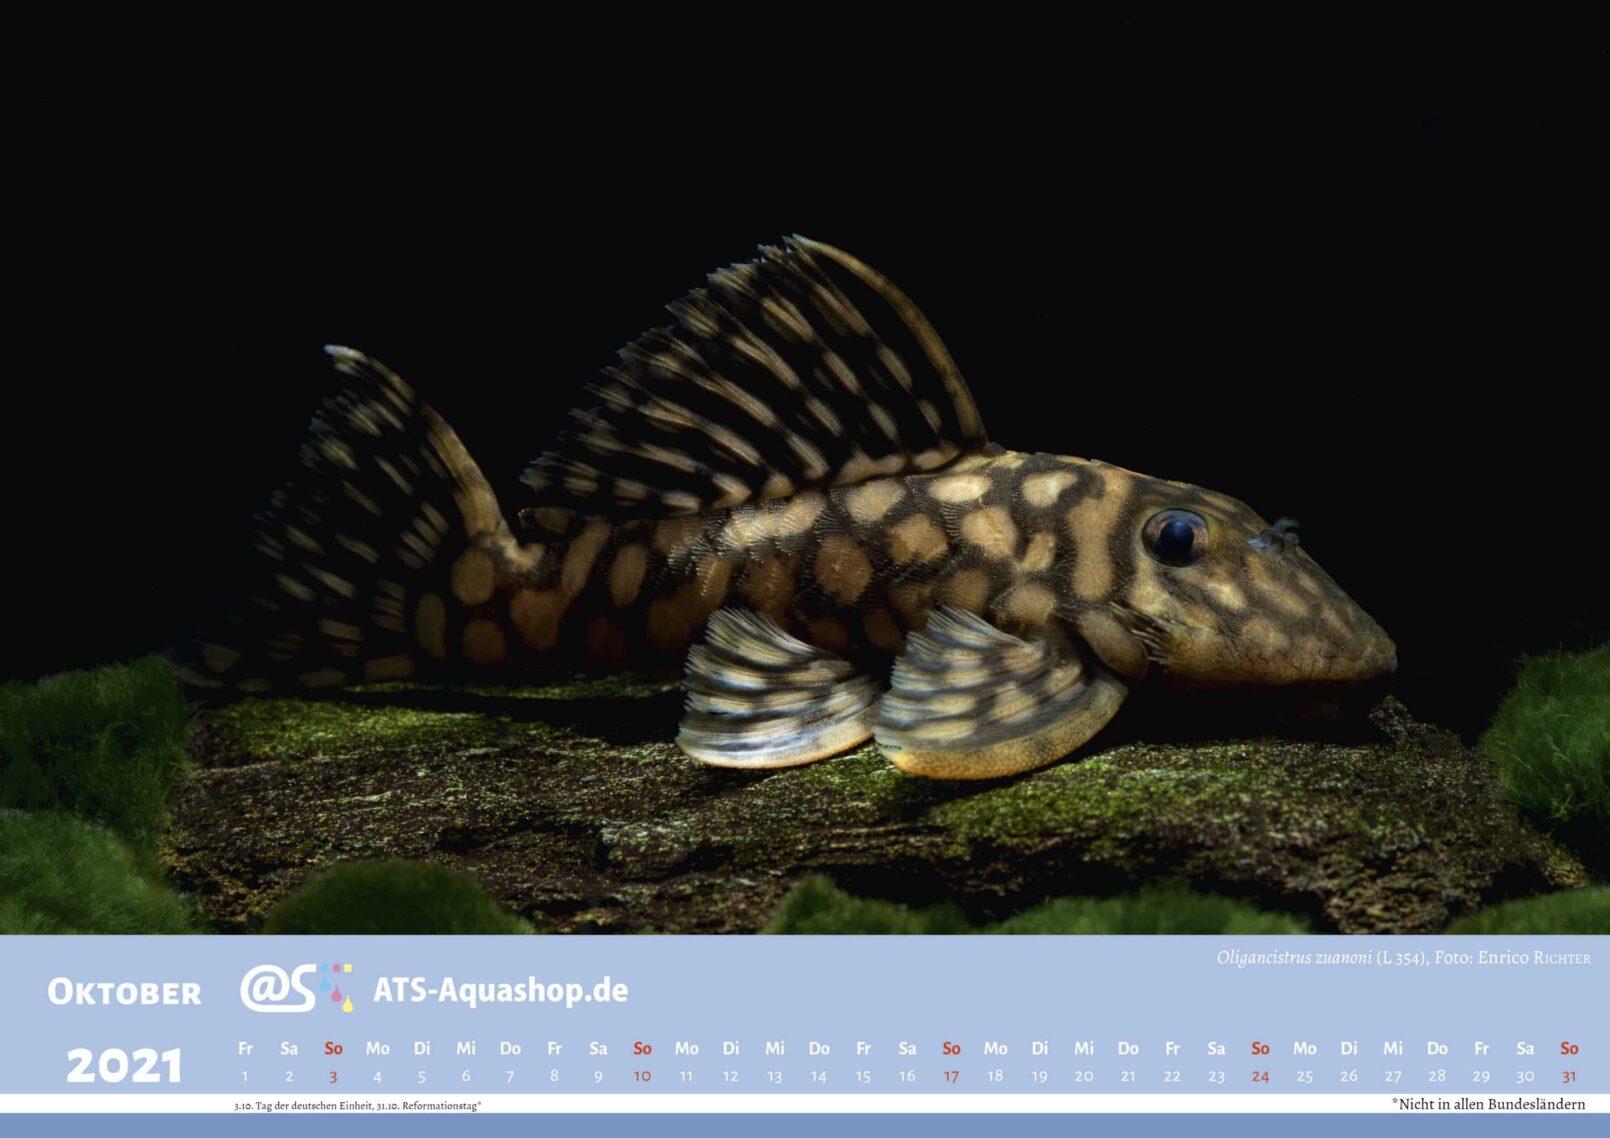 ATS-Aquashop Foto Jahreskalender 2021 DIN A3 (Oktober): Oligancistrus zuanoni (L 20) / Spectracanthicus zuanoni (L 20)